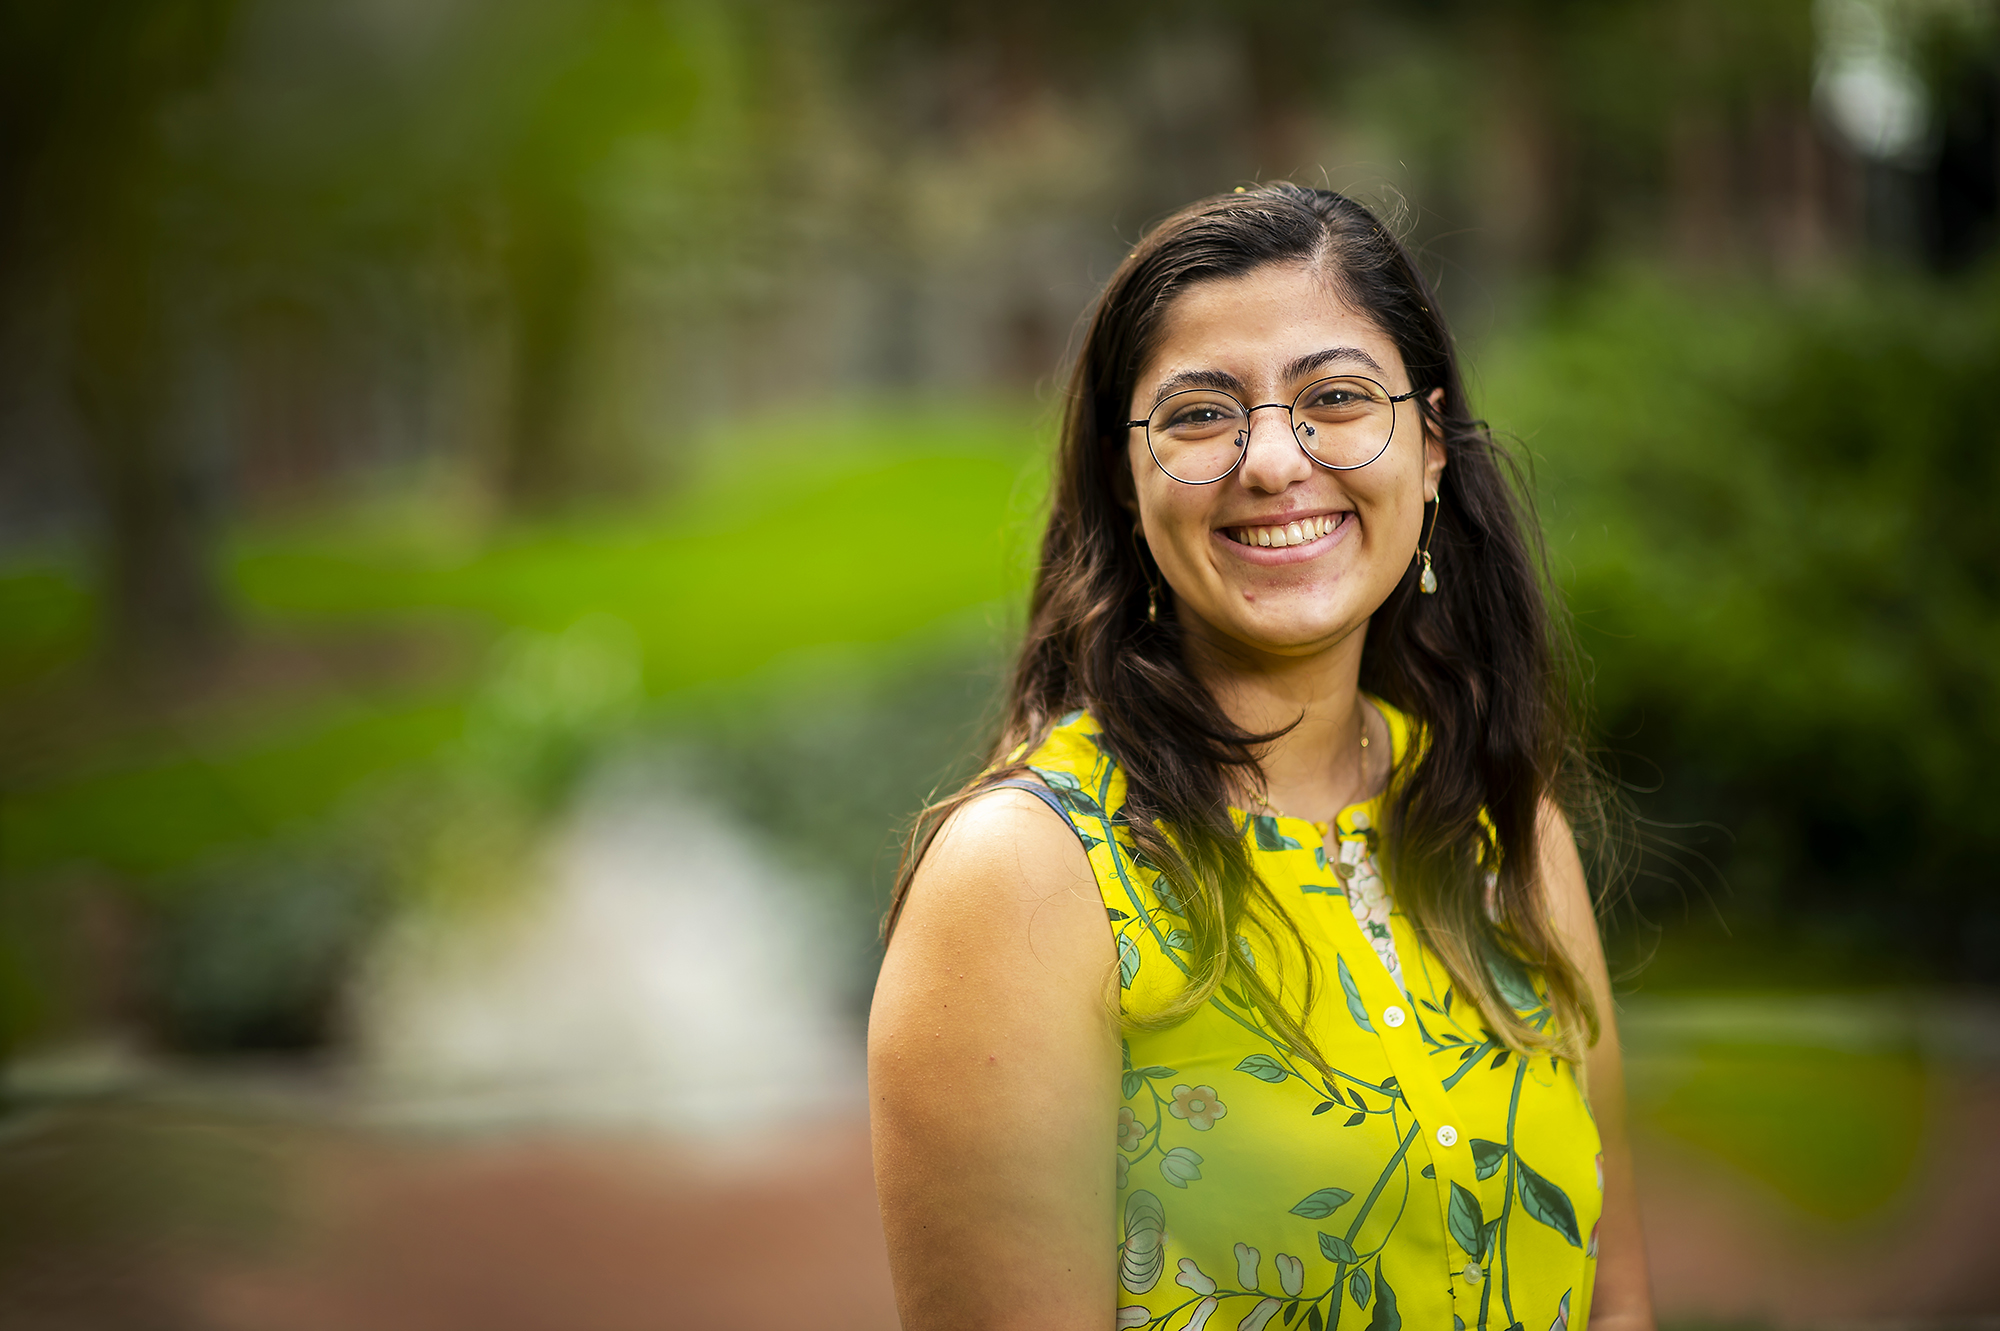 a profile of Yasmina Al Ghadban